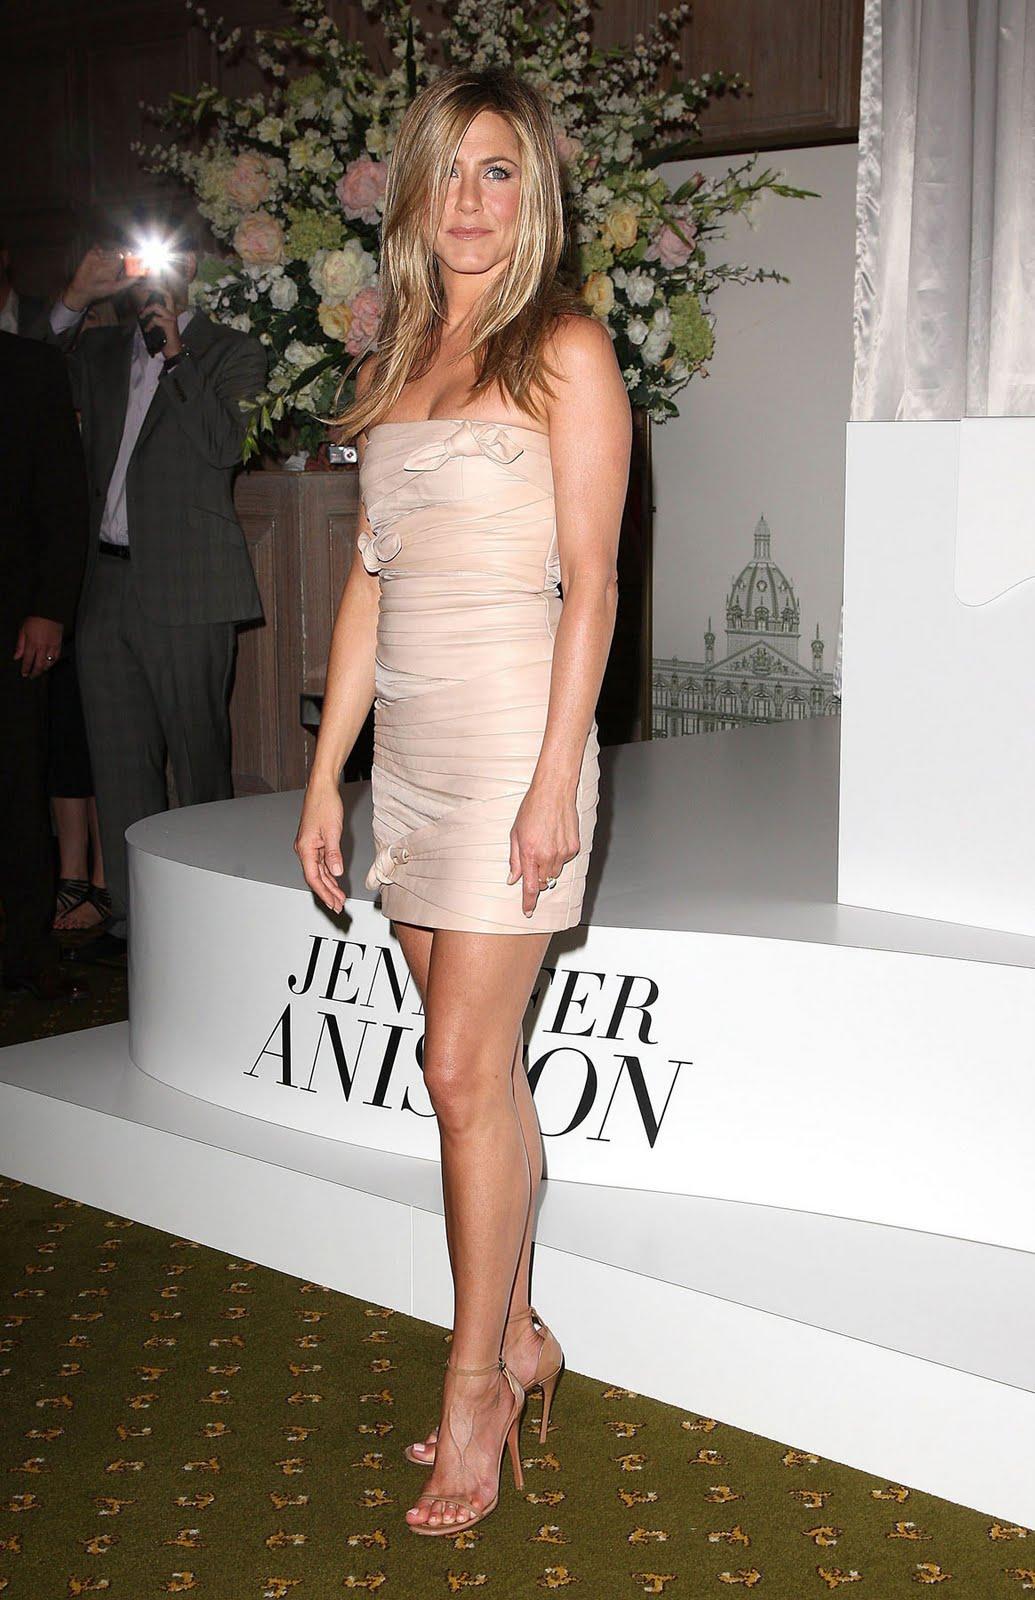 http://2.bp.blogspot.com/-bAsKQfnfS-g/TeykjswTDiI/AAAAAAAAAP4/ji5Kiz5zHog/s1600/Jennifer+Aniston+%25286%2529.jpg